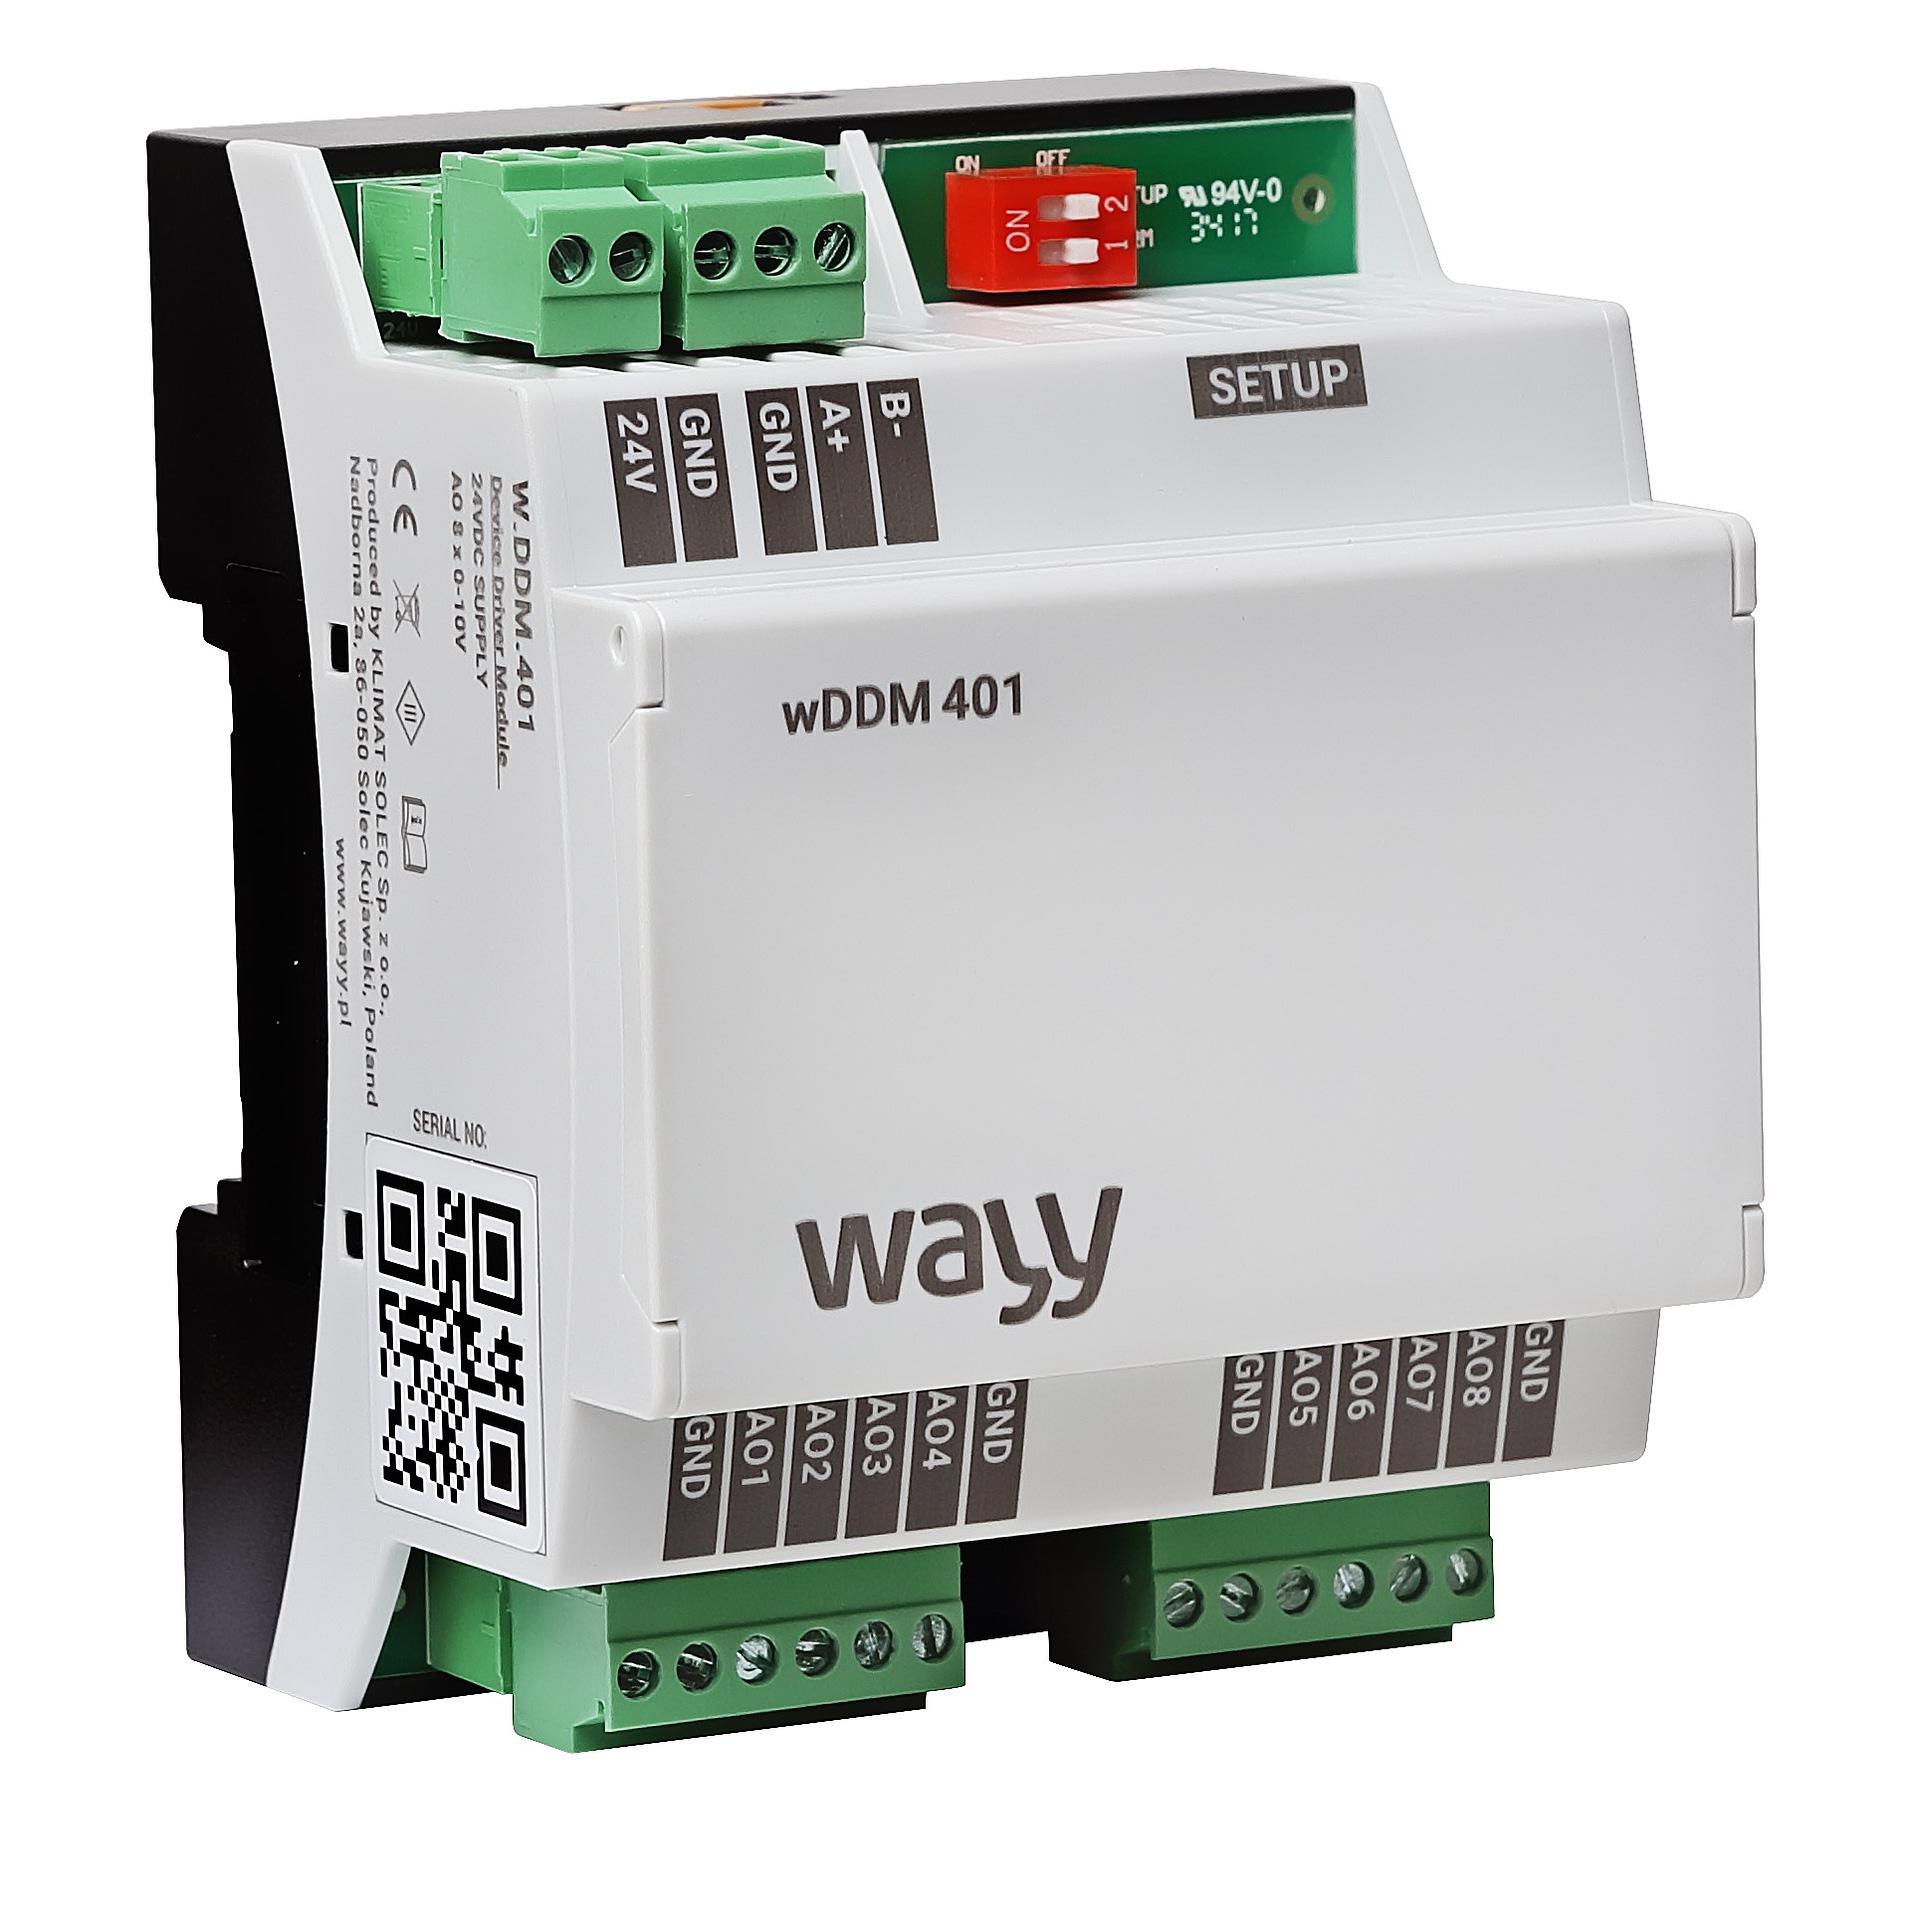 wDDM401 - nowy kąt